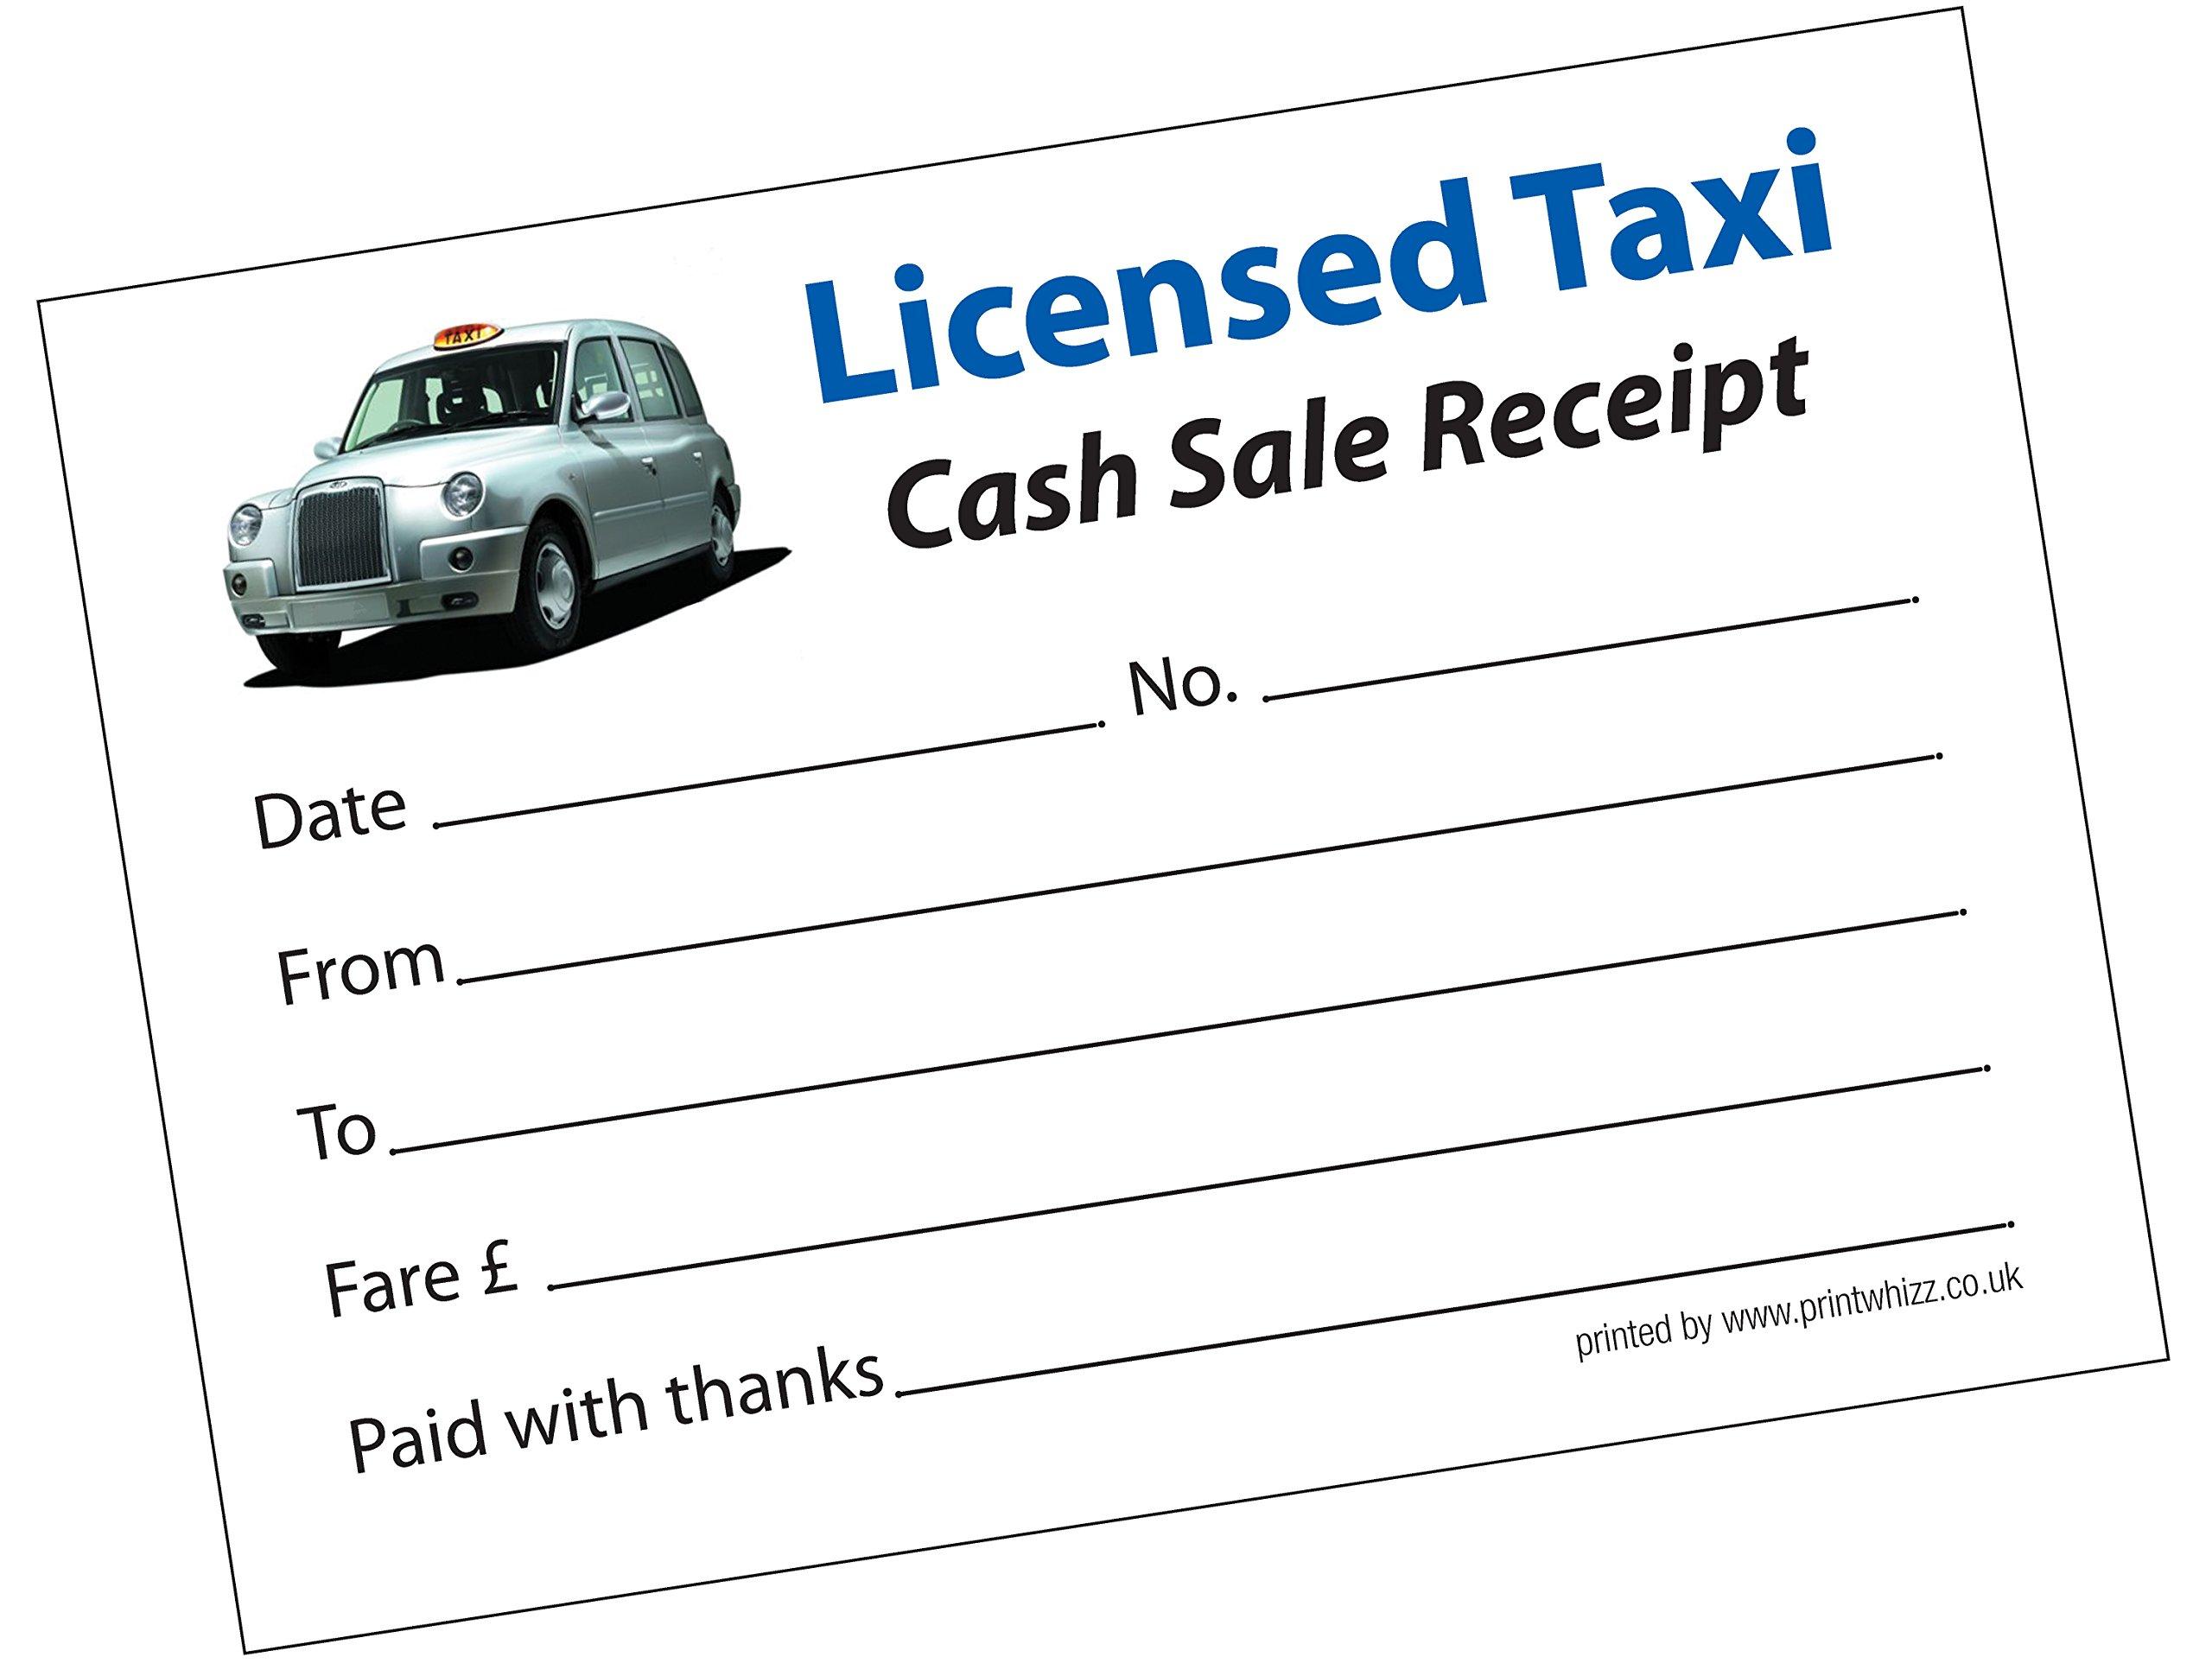 3 X Licensed Taxi Minicab Receipt Pad Buy Online In Burundi At Burundi Desertcart Com Productid 57068613